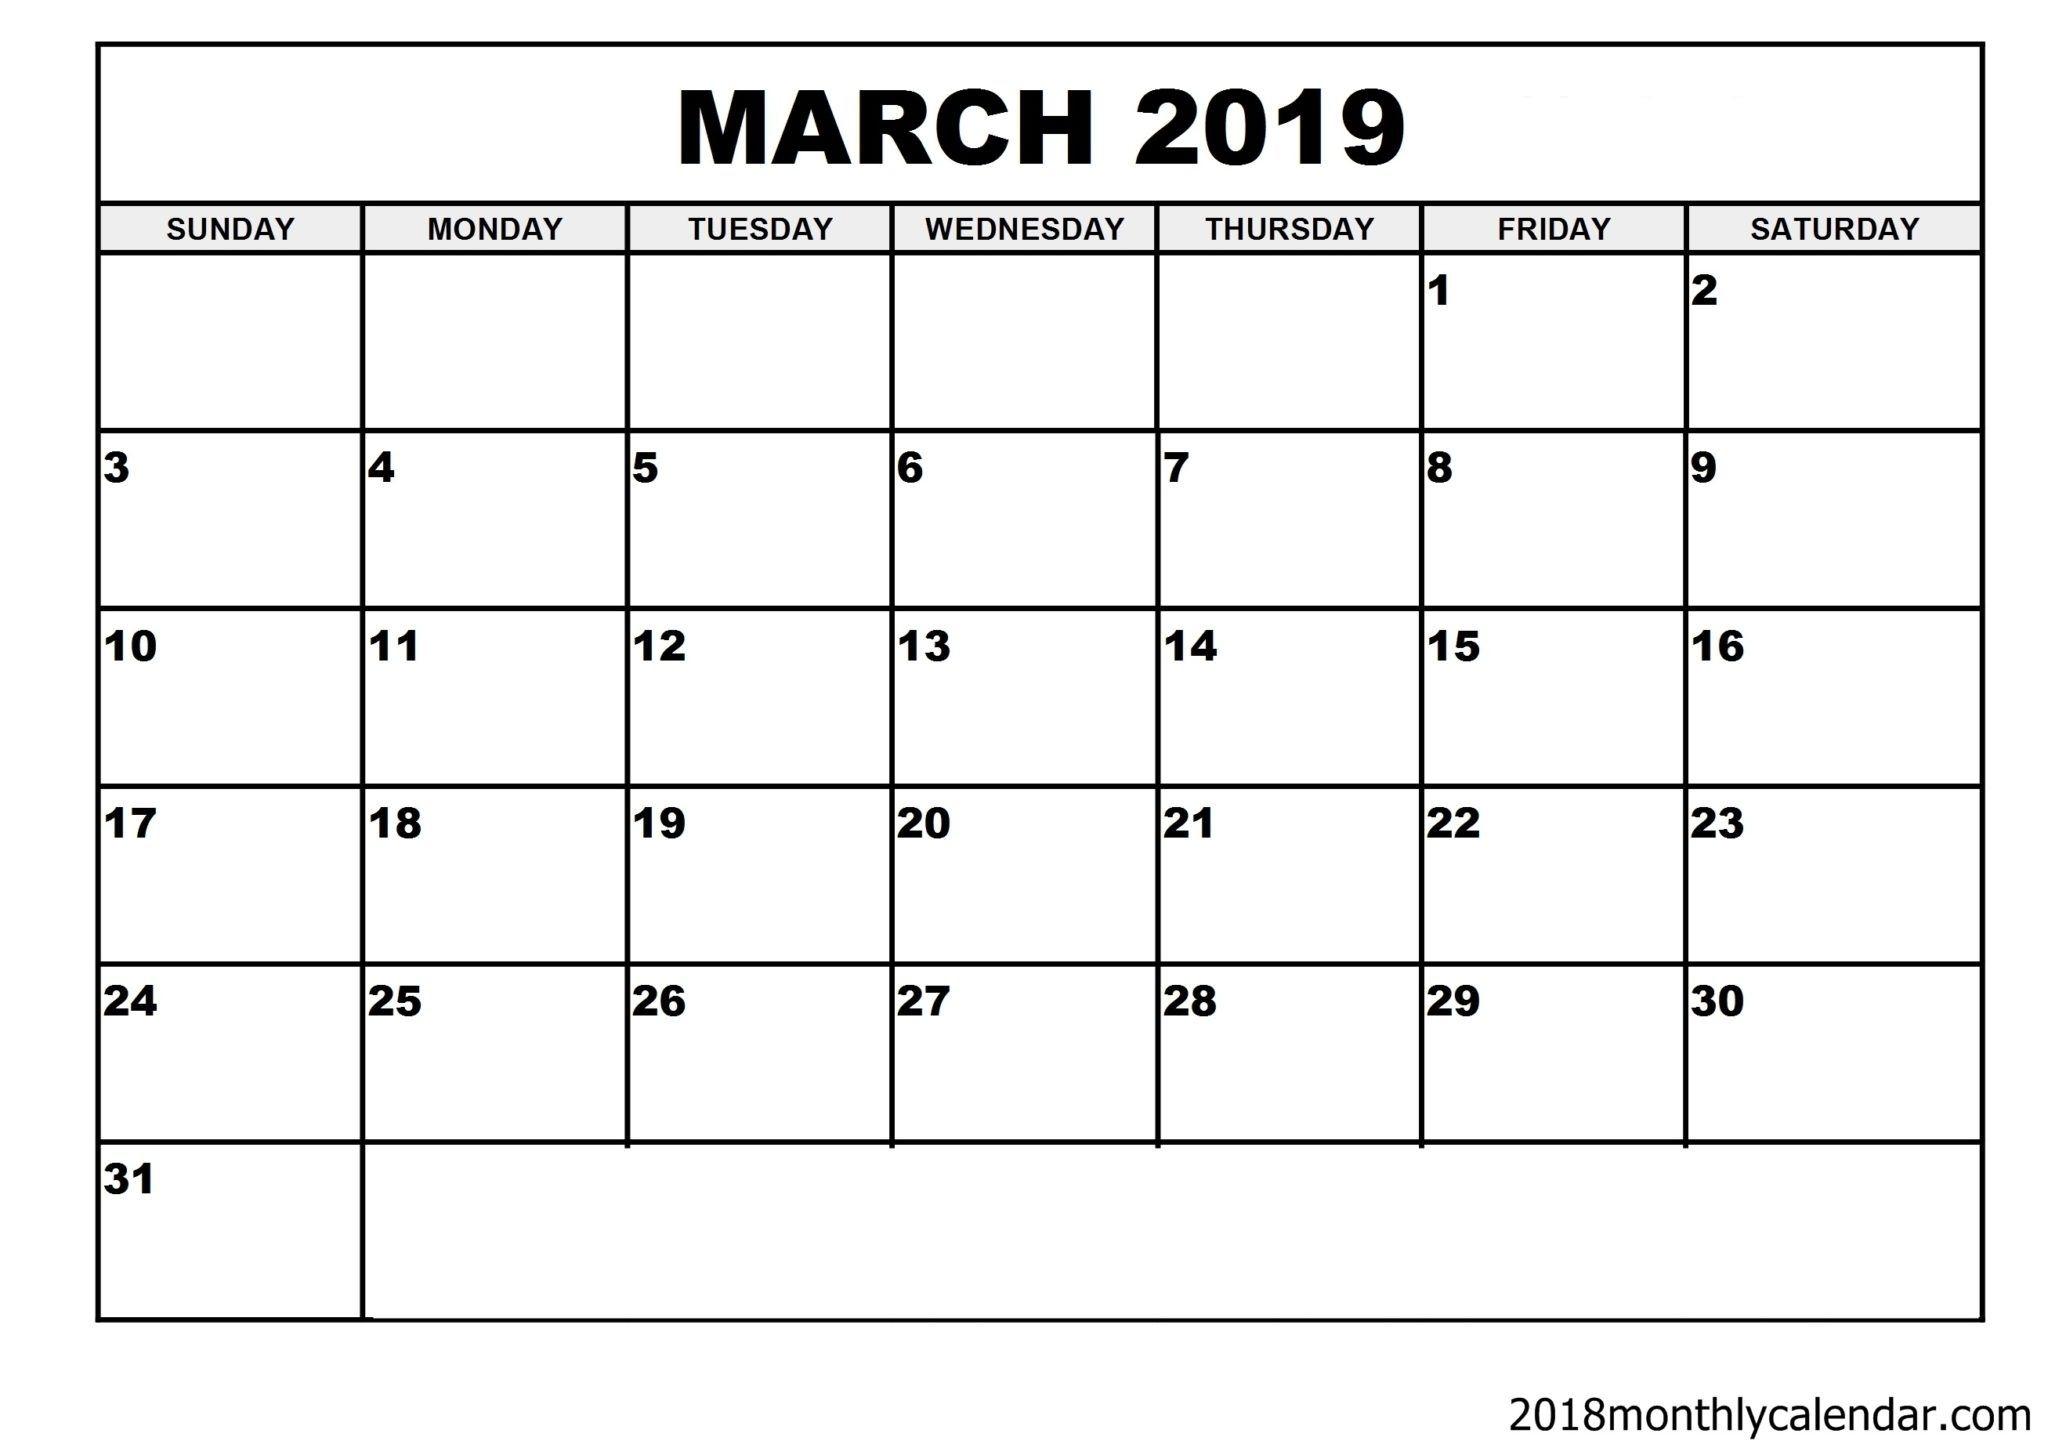 Download March 2019 Calendar - Blank Template - Editable Calendar Template | Editable Calendar